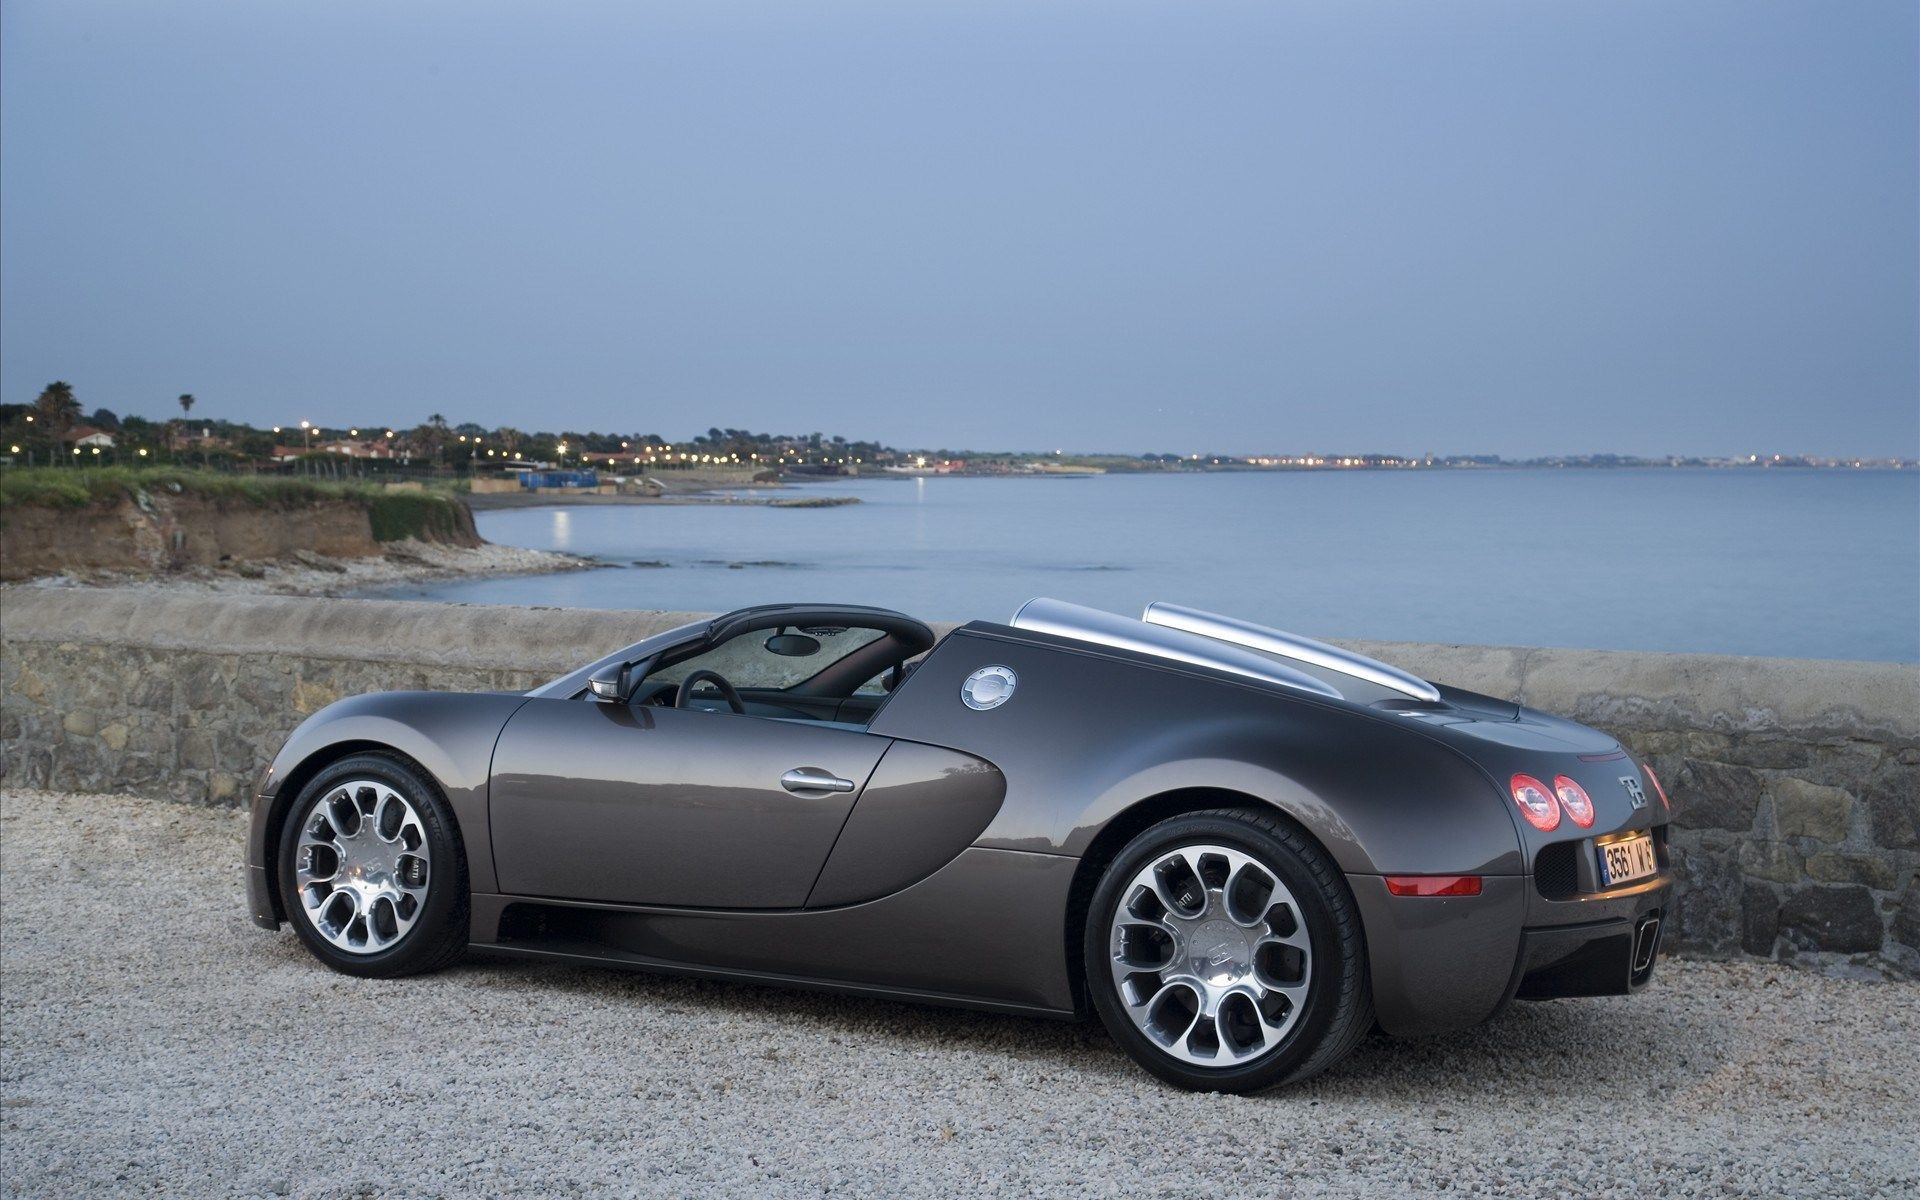 d4f4e3109411f671358b5c37fddee78c Stunning Bugatti Veyron Price In Brazil Cars Trend